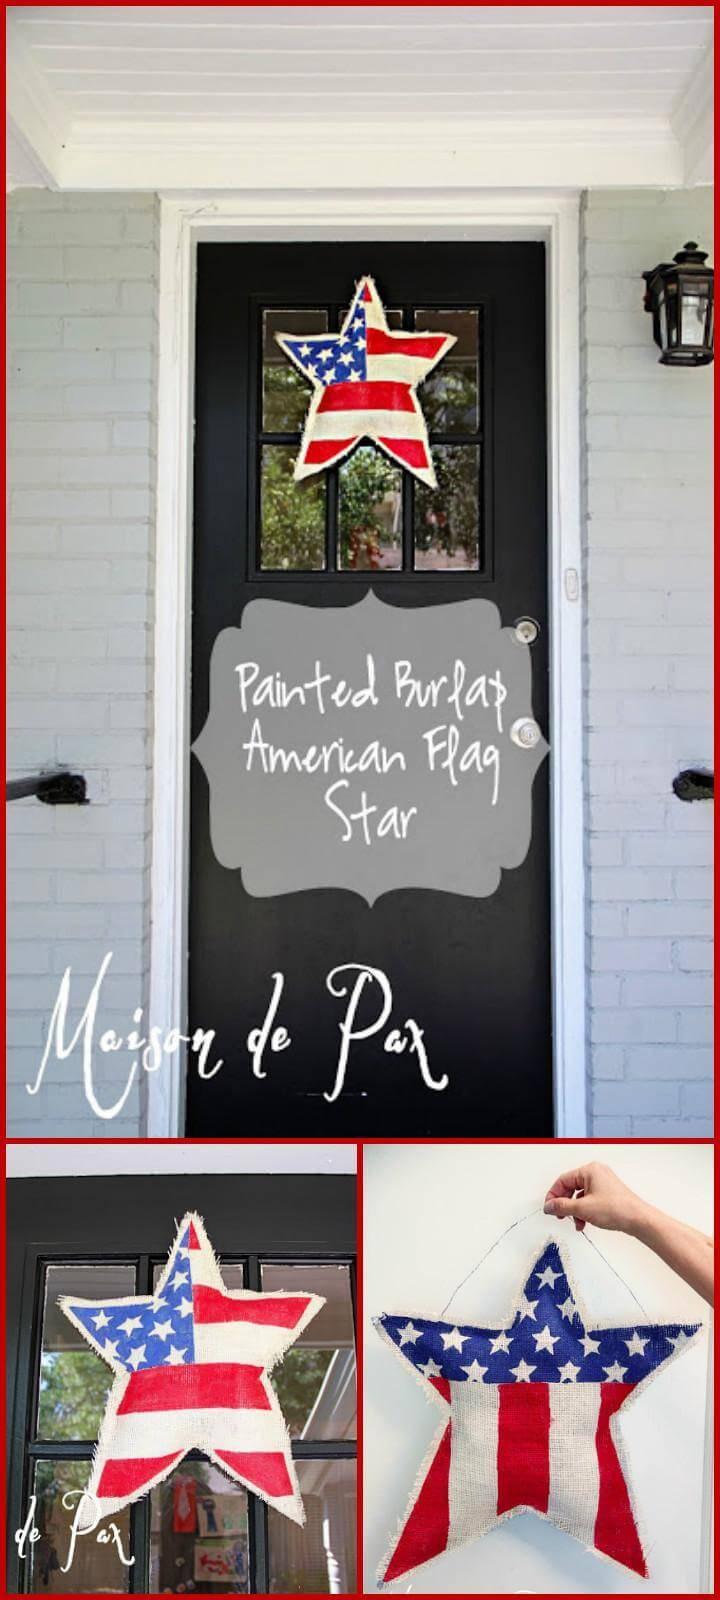 DIY easy painted burlap American flag star